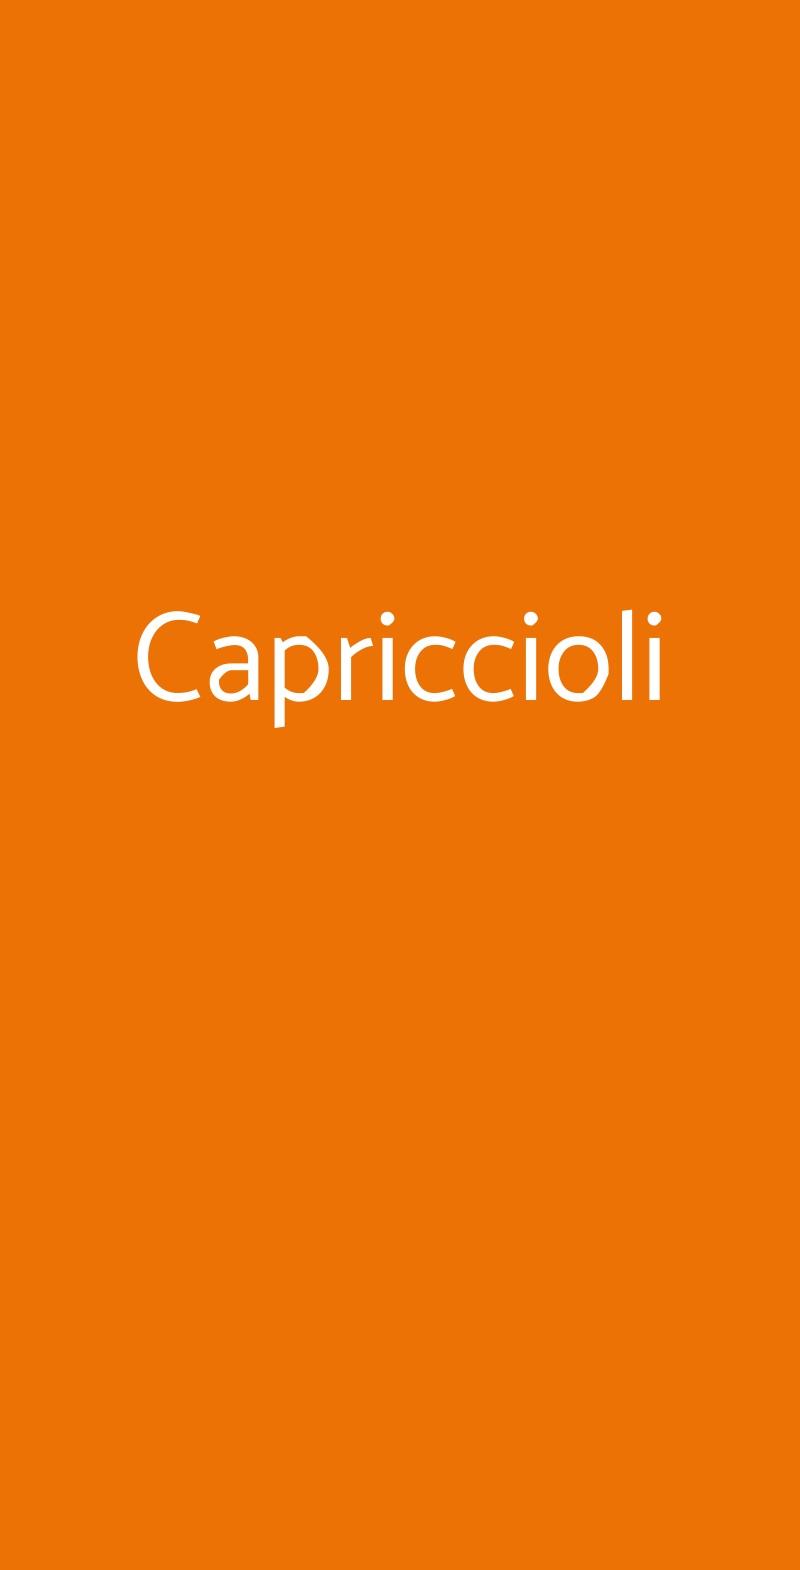 Capriccioli Torino menù 1 pagina